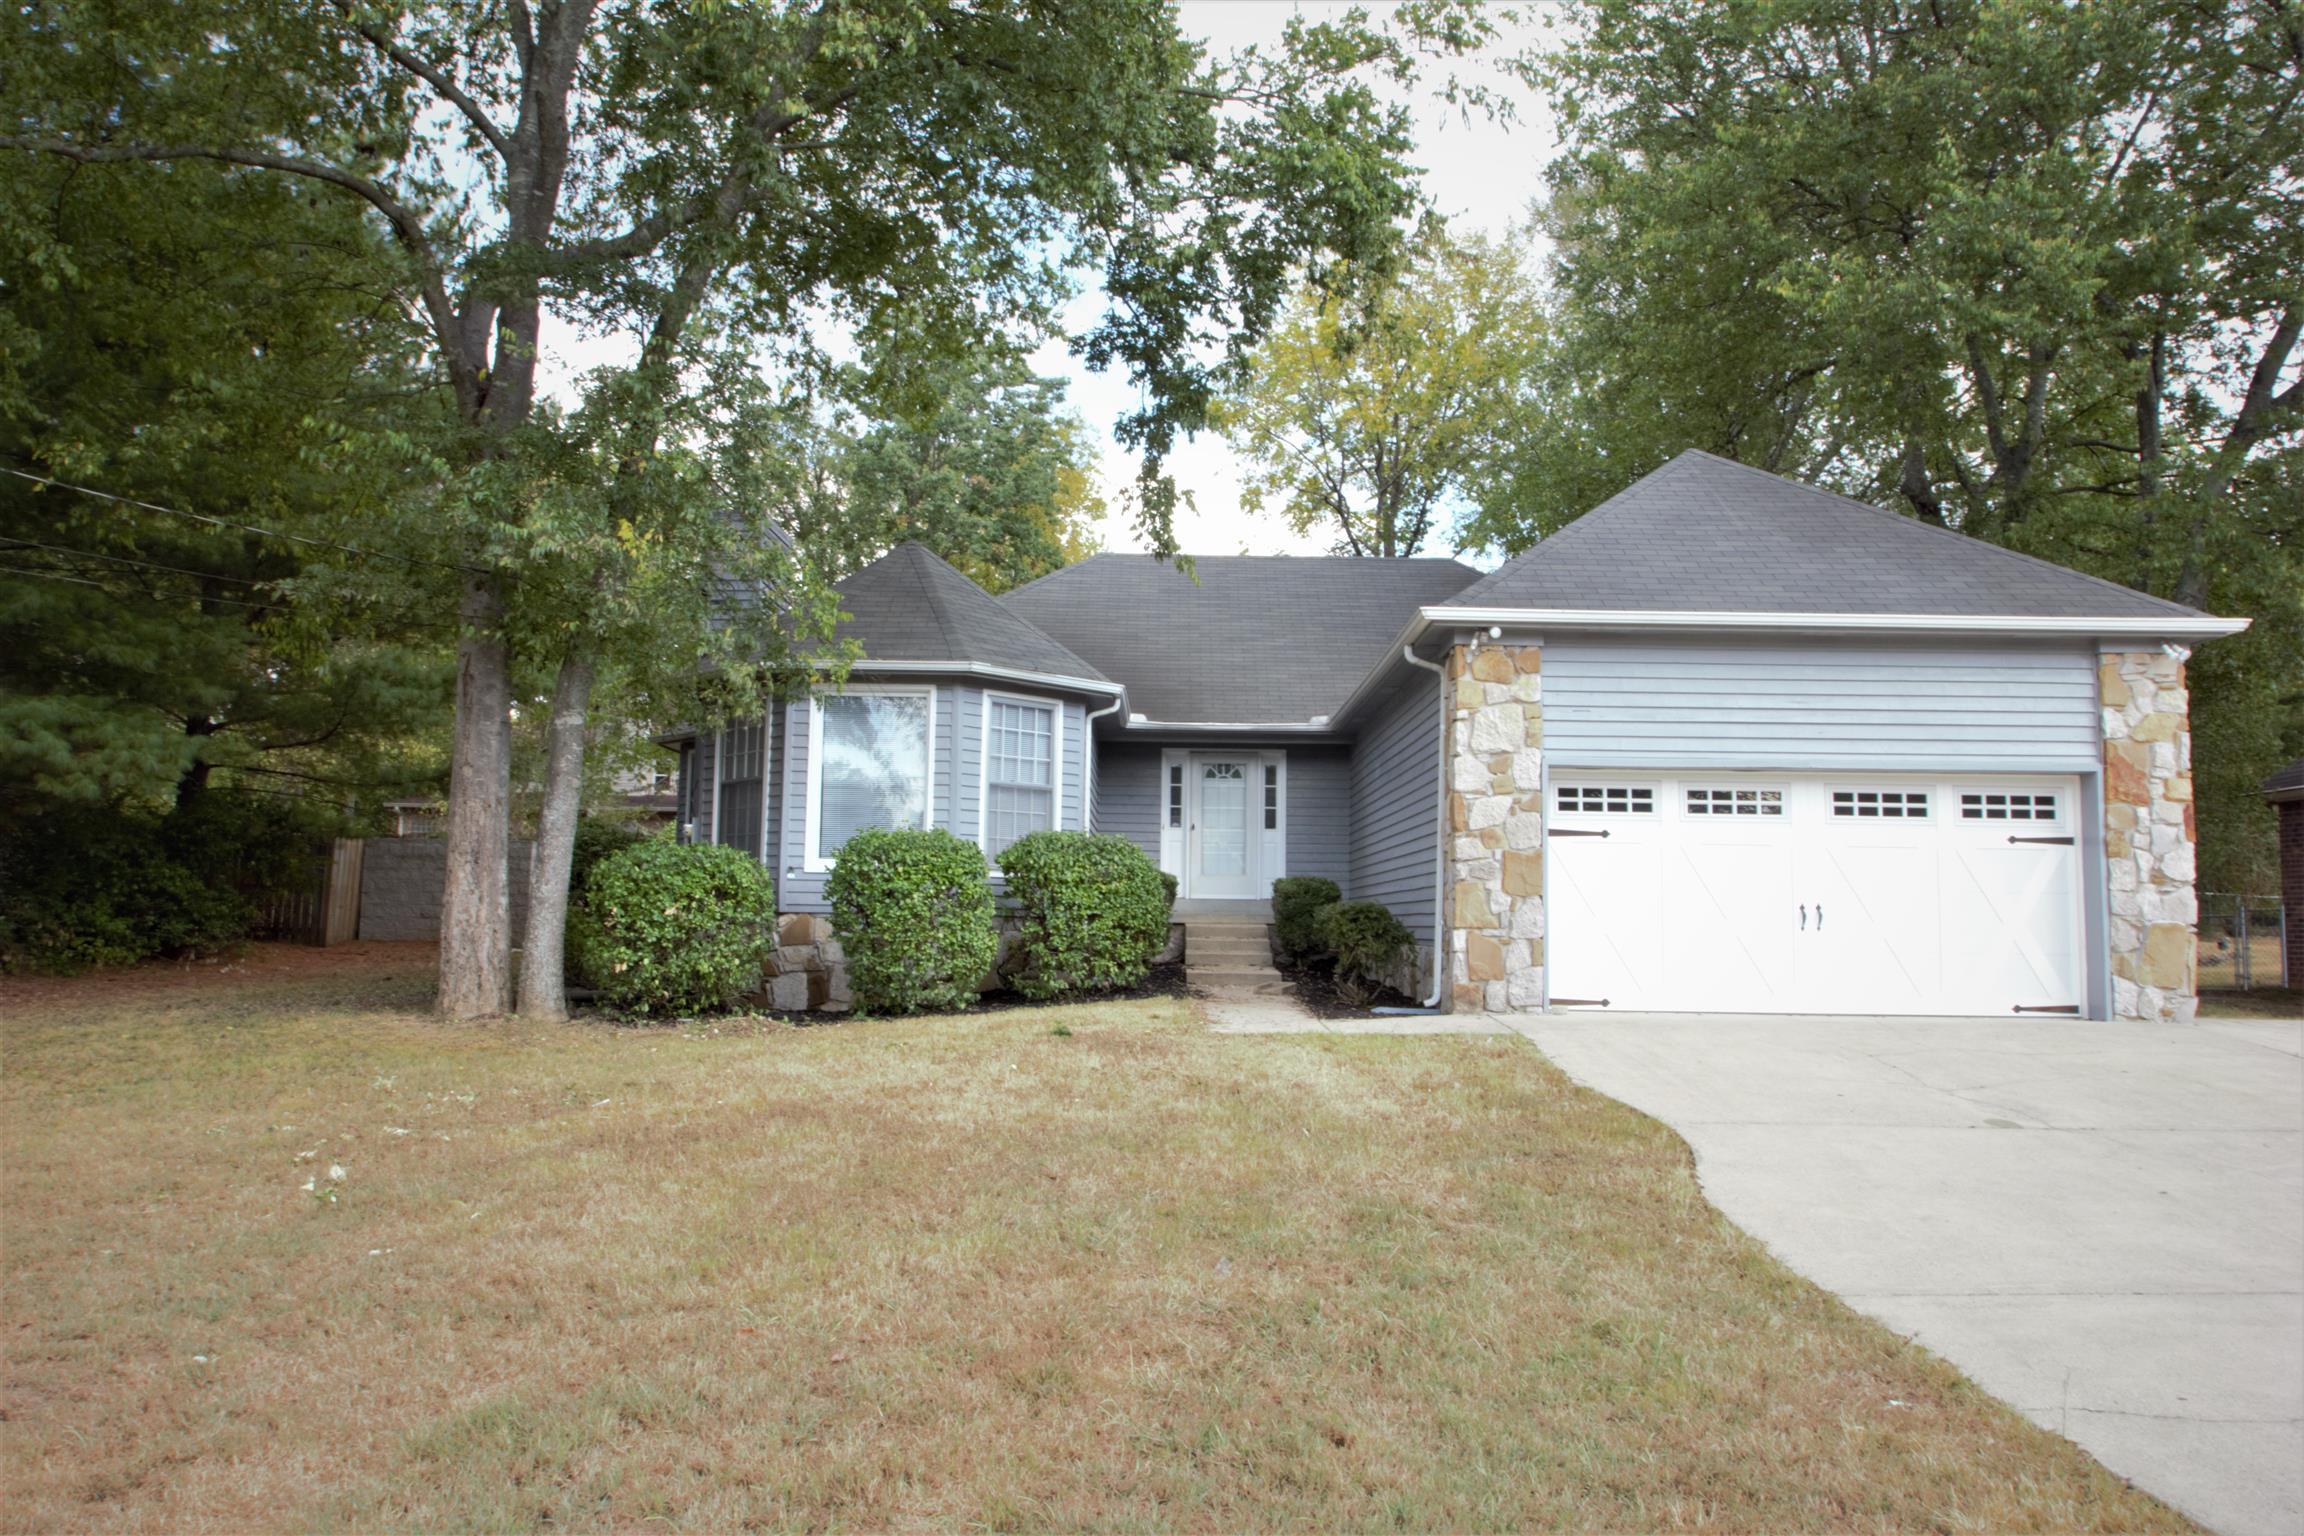 203 Woodshire Dr, Smyrna, TN 37167 - Smyrna, TN real estate listing